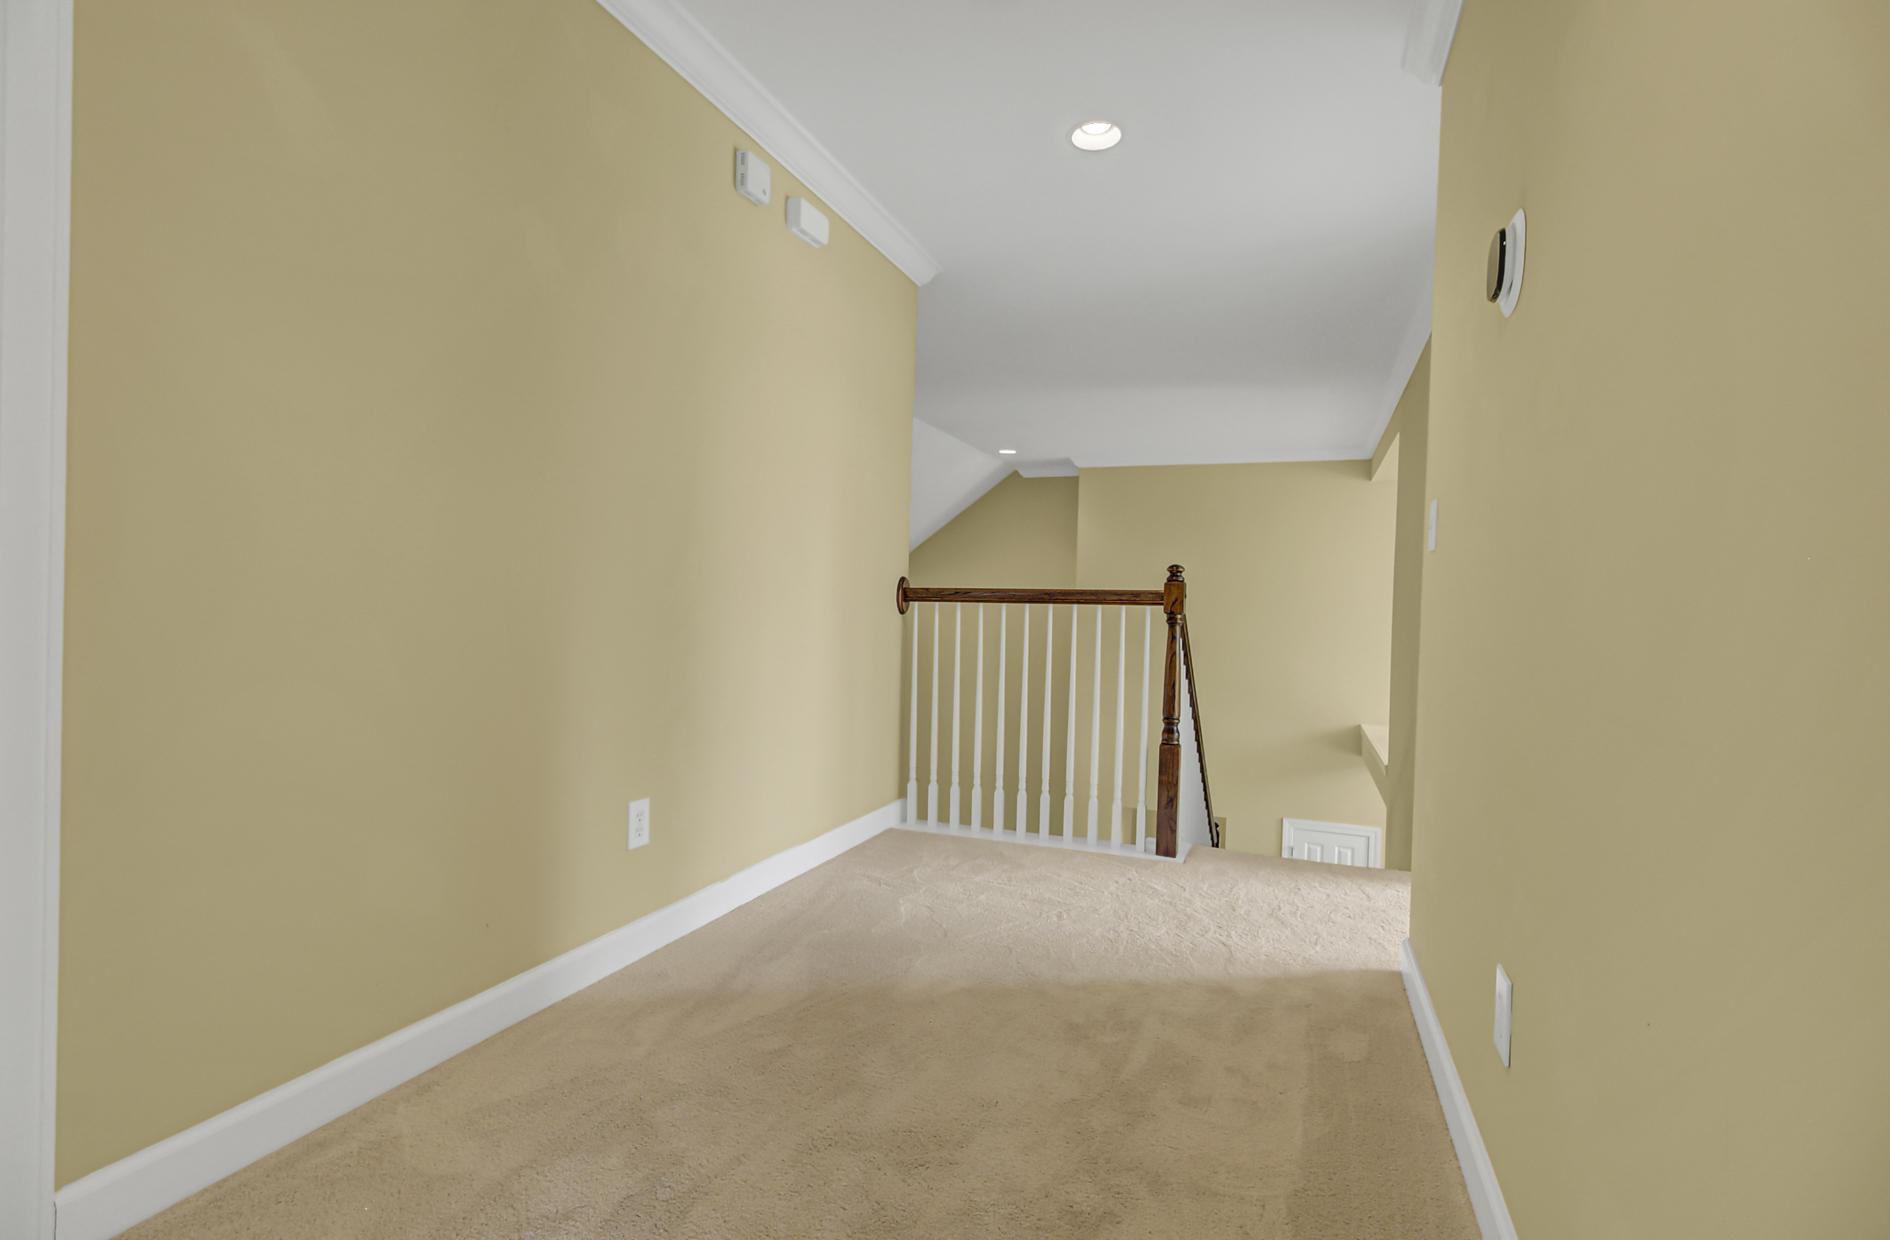 Marsh Cove Homes For Sale - 2928 Riverwood, Mount Pleasant, SC - 16